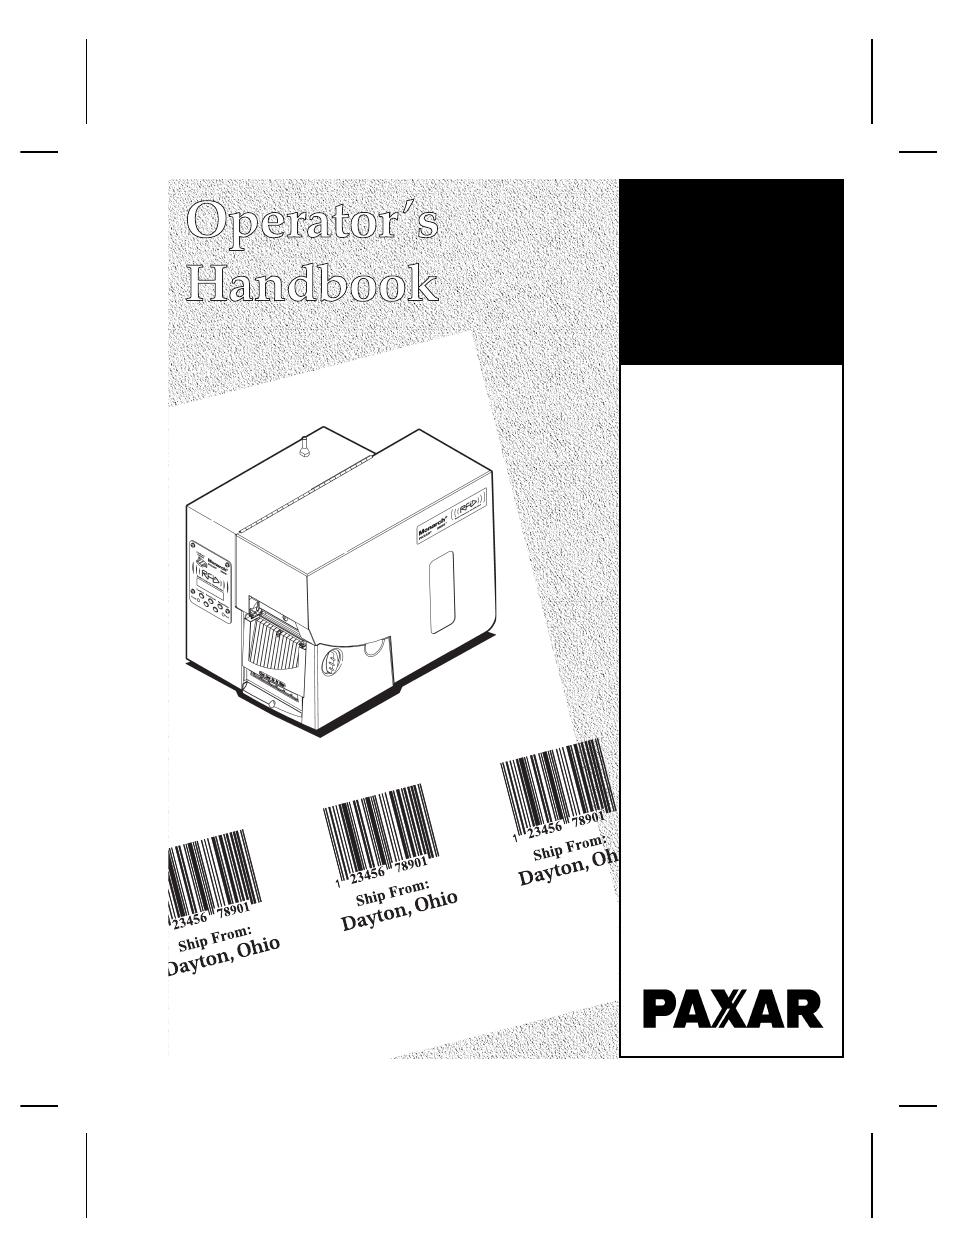 paxar monarch 9855 rfid printer user manual 124 pages rh manualsdir com Monarch Printer 9825 Monarch 9855 Error Codes